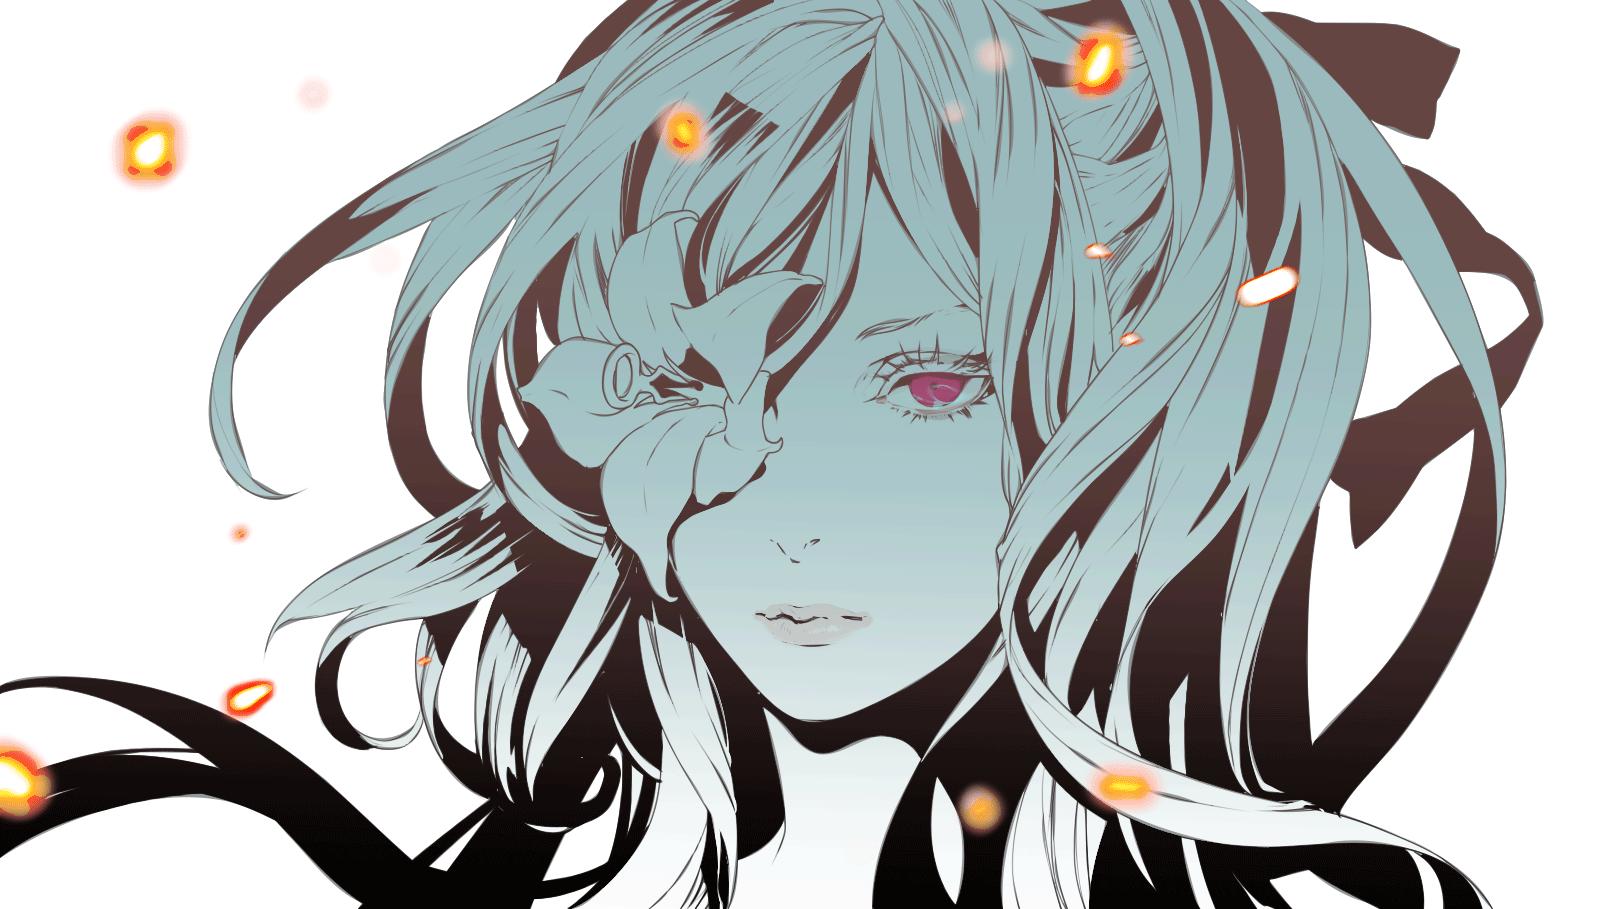 Wallpaper : Illustration, Anime Girls, Cartoon, Demon